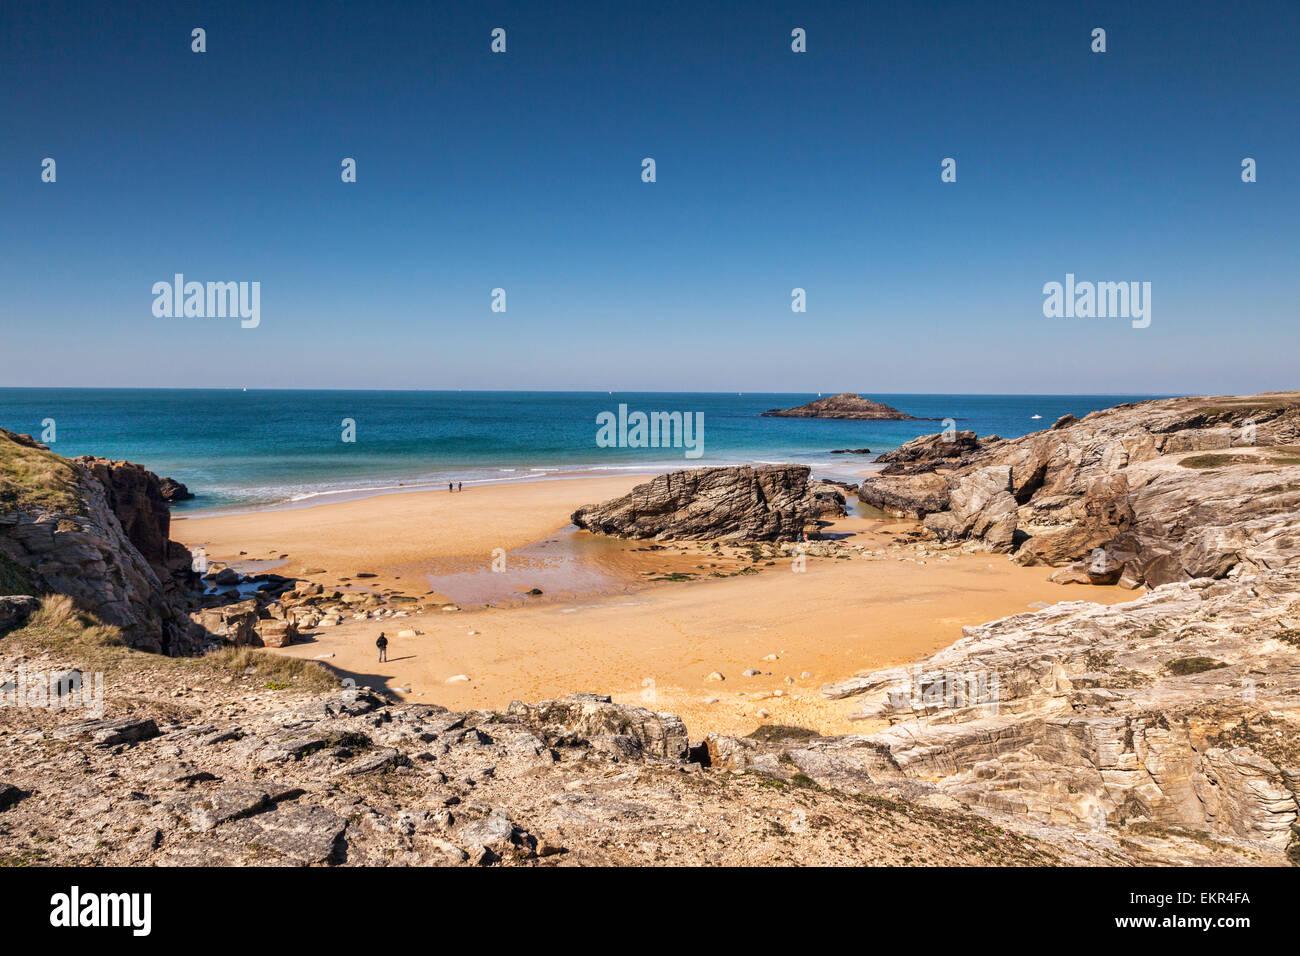 Port Bara, Quiberon Peninsula, Brittany, France. - Stock Image